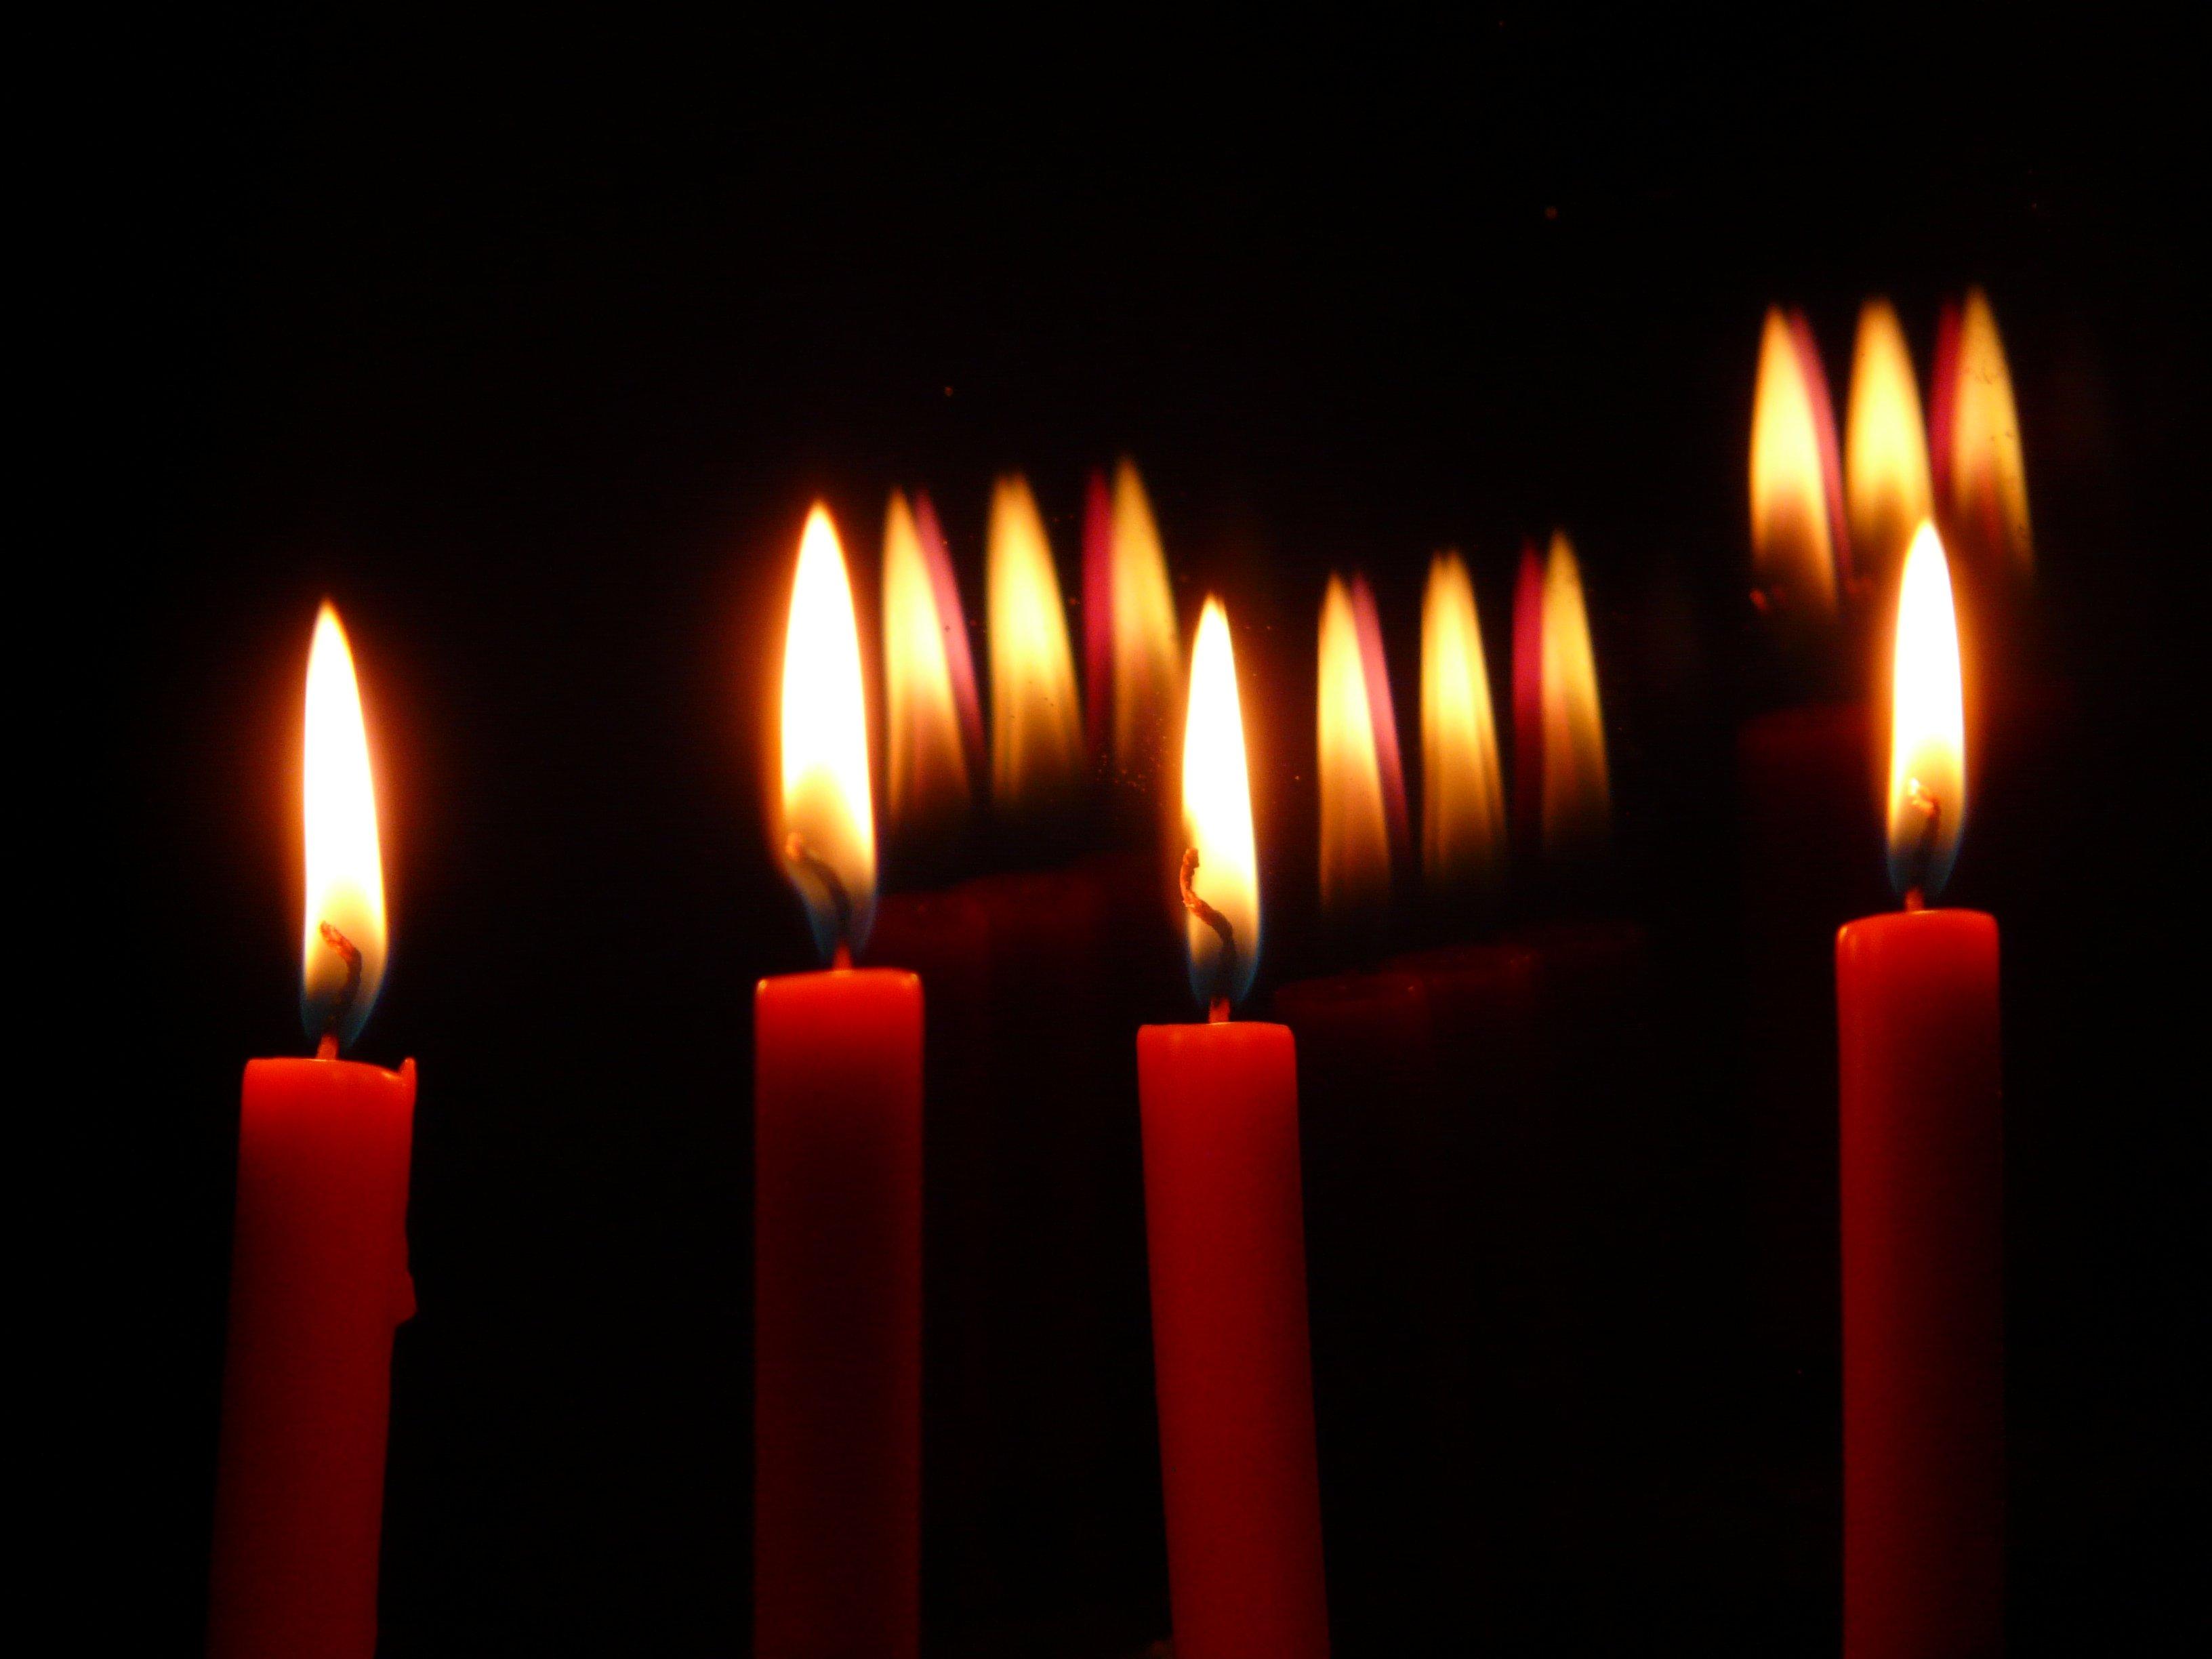 kostenlose foto licht fenster urlaub flamme dunkelheit kerze beleuchtung kerzen docht. Black Bedroom Furniture Sets. Home Design Ideas